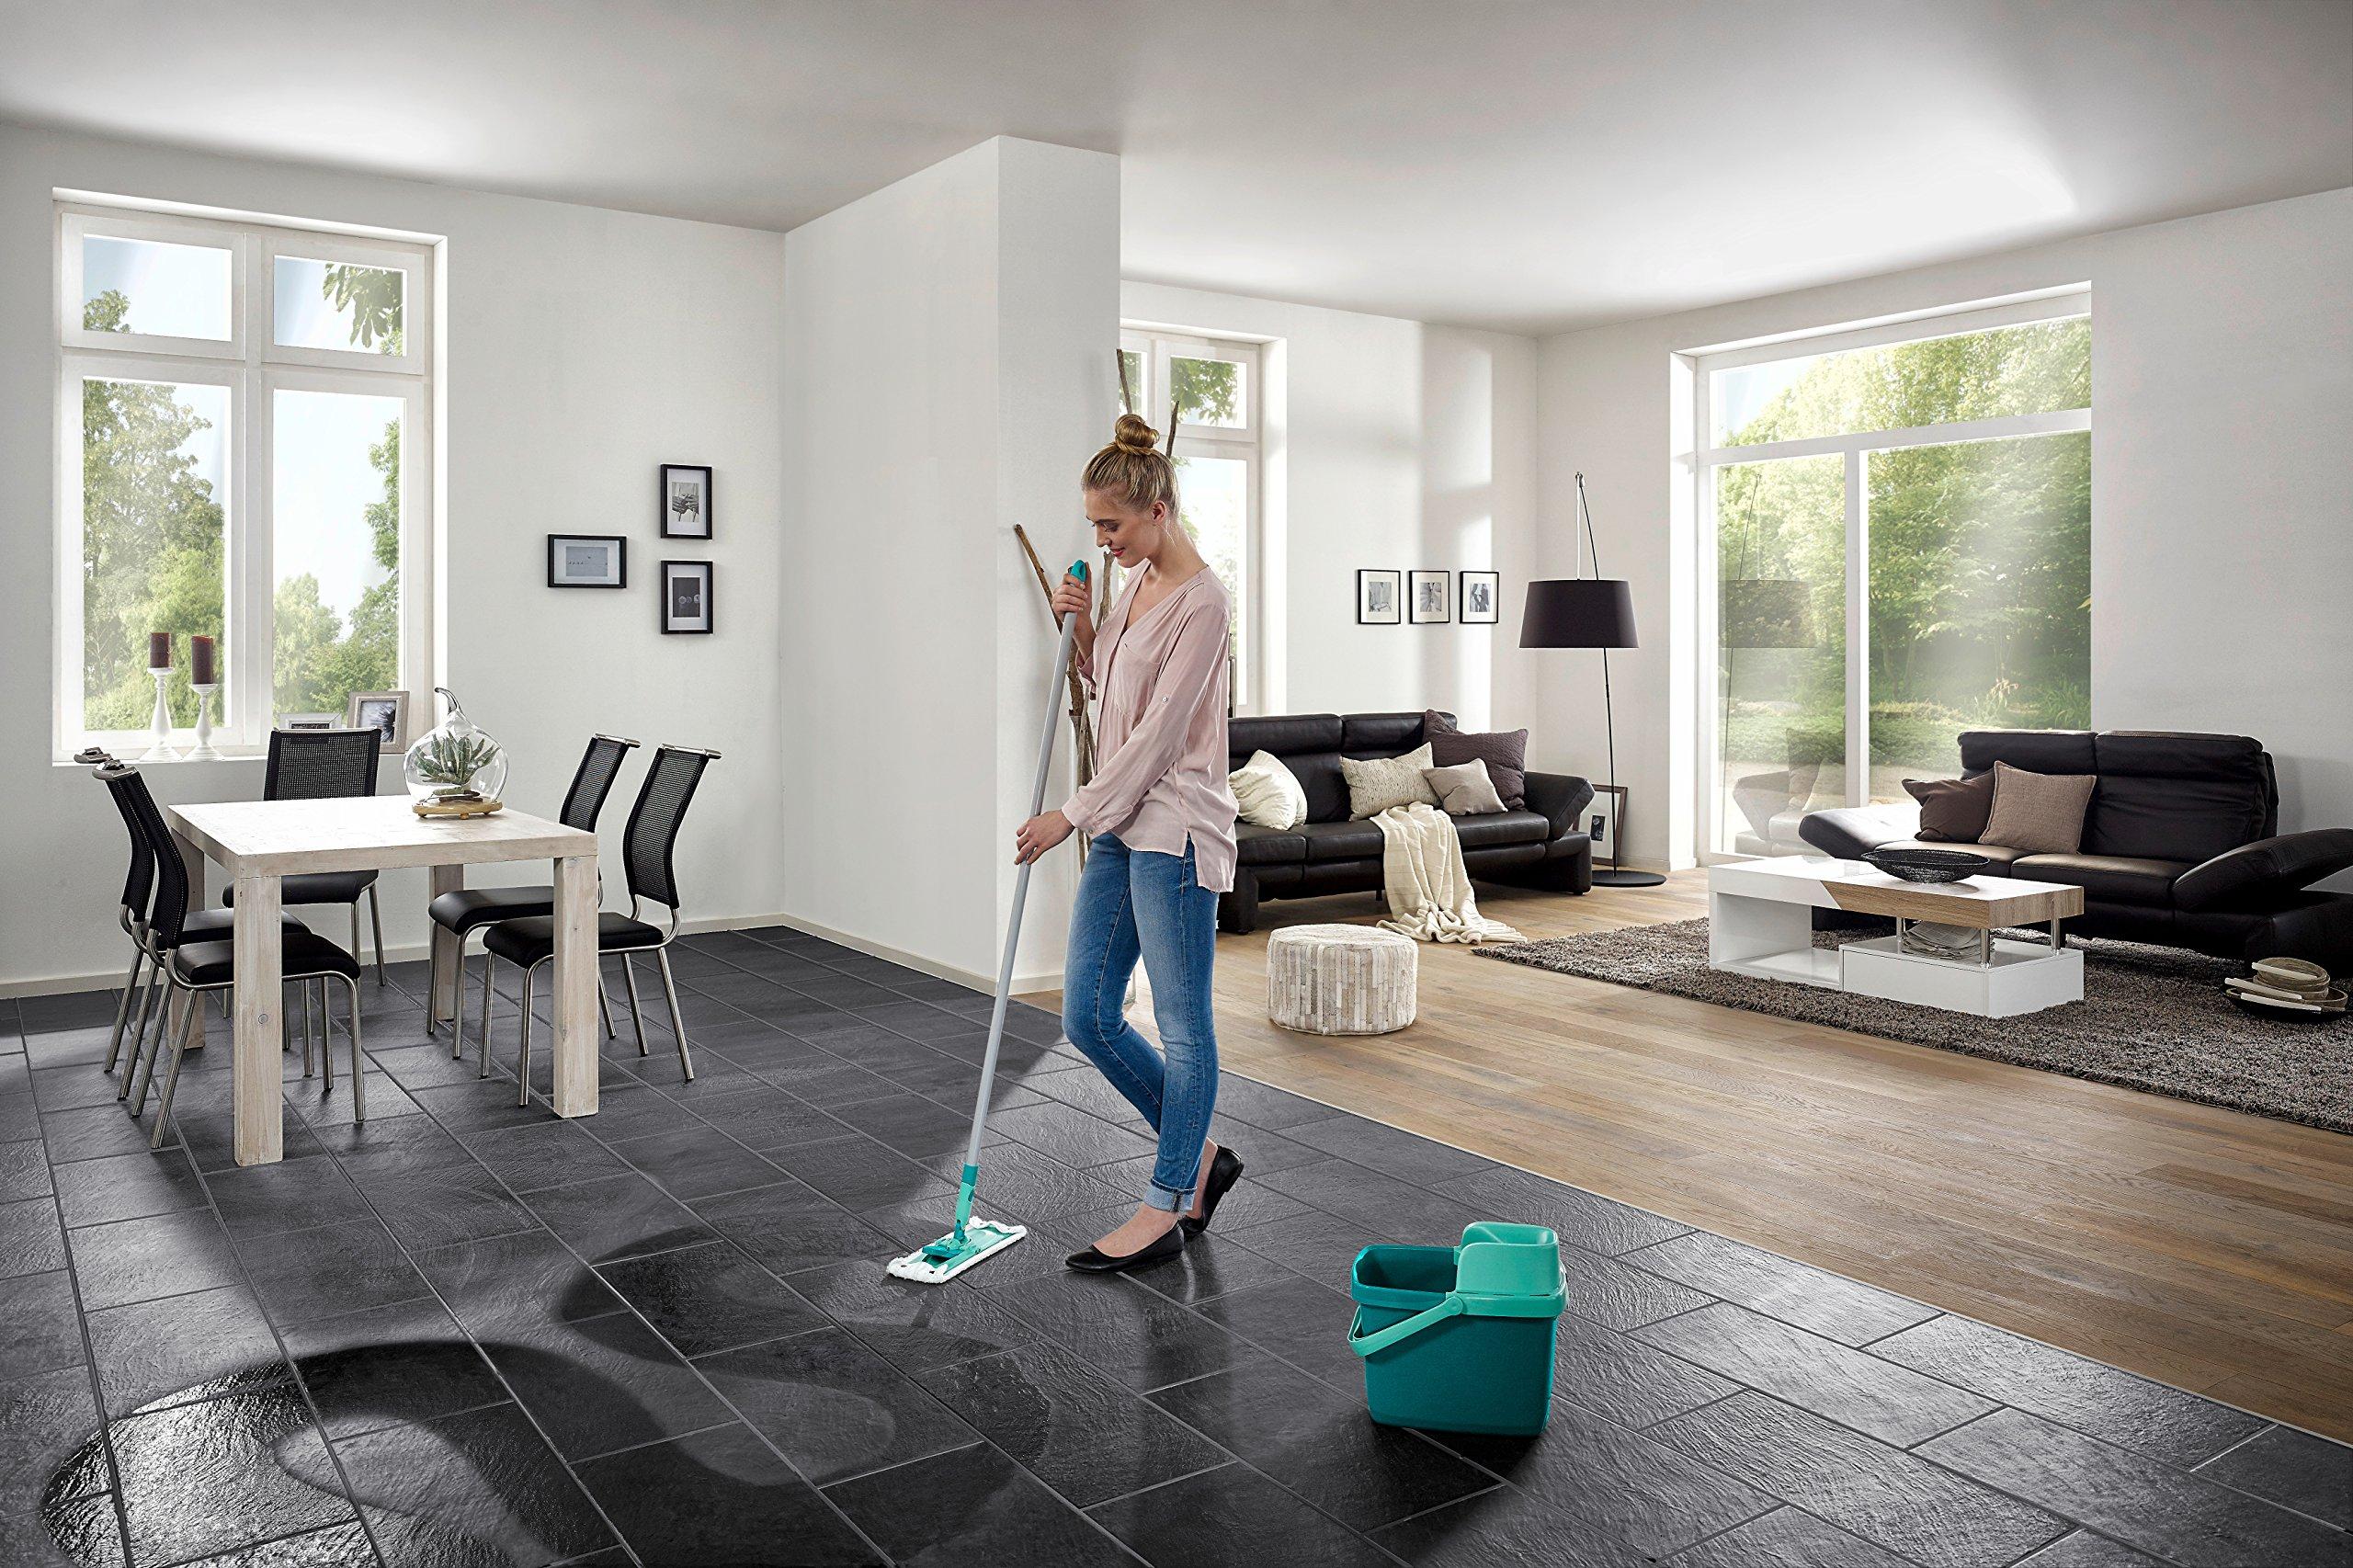 leifheit 55356 set combi clean inkl eimer mit presse. Black Bedroom Furniture Sets. Home Design Ideas